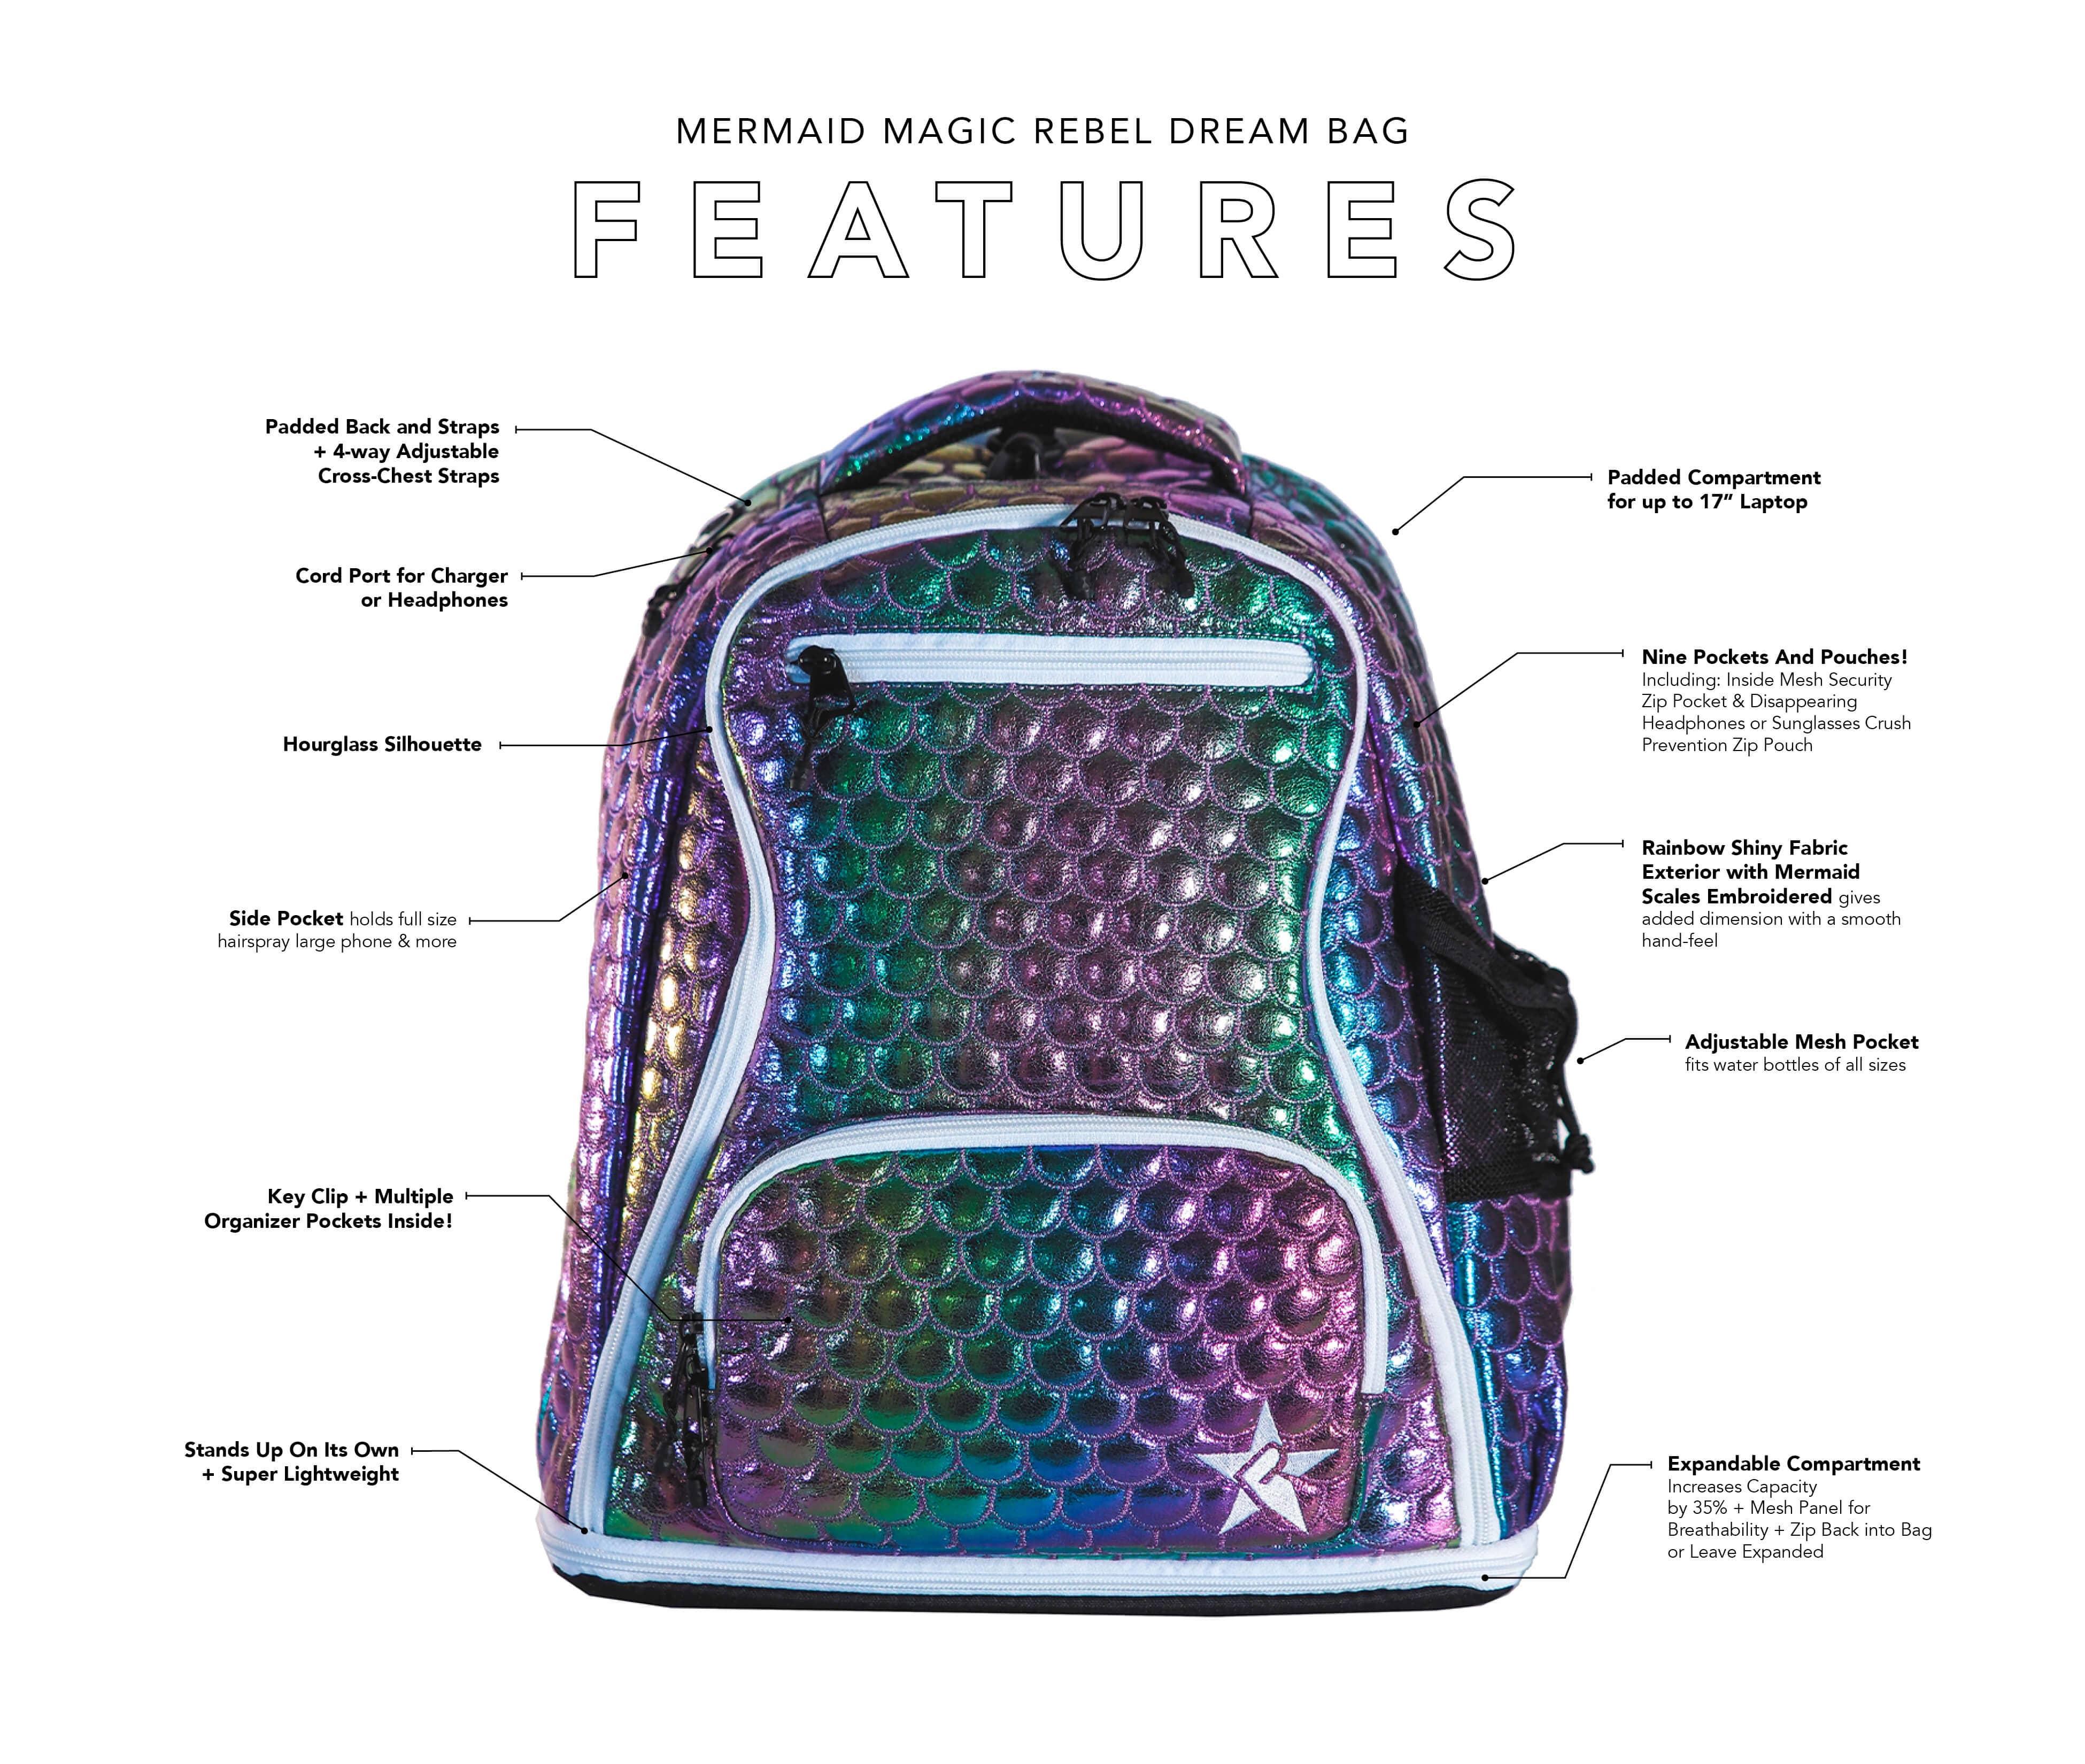 mermaid magic cheer bag main features